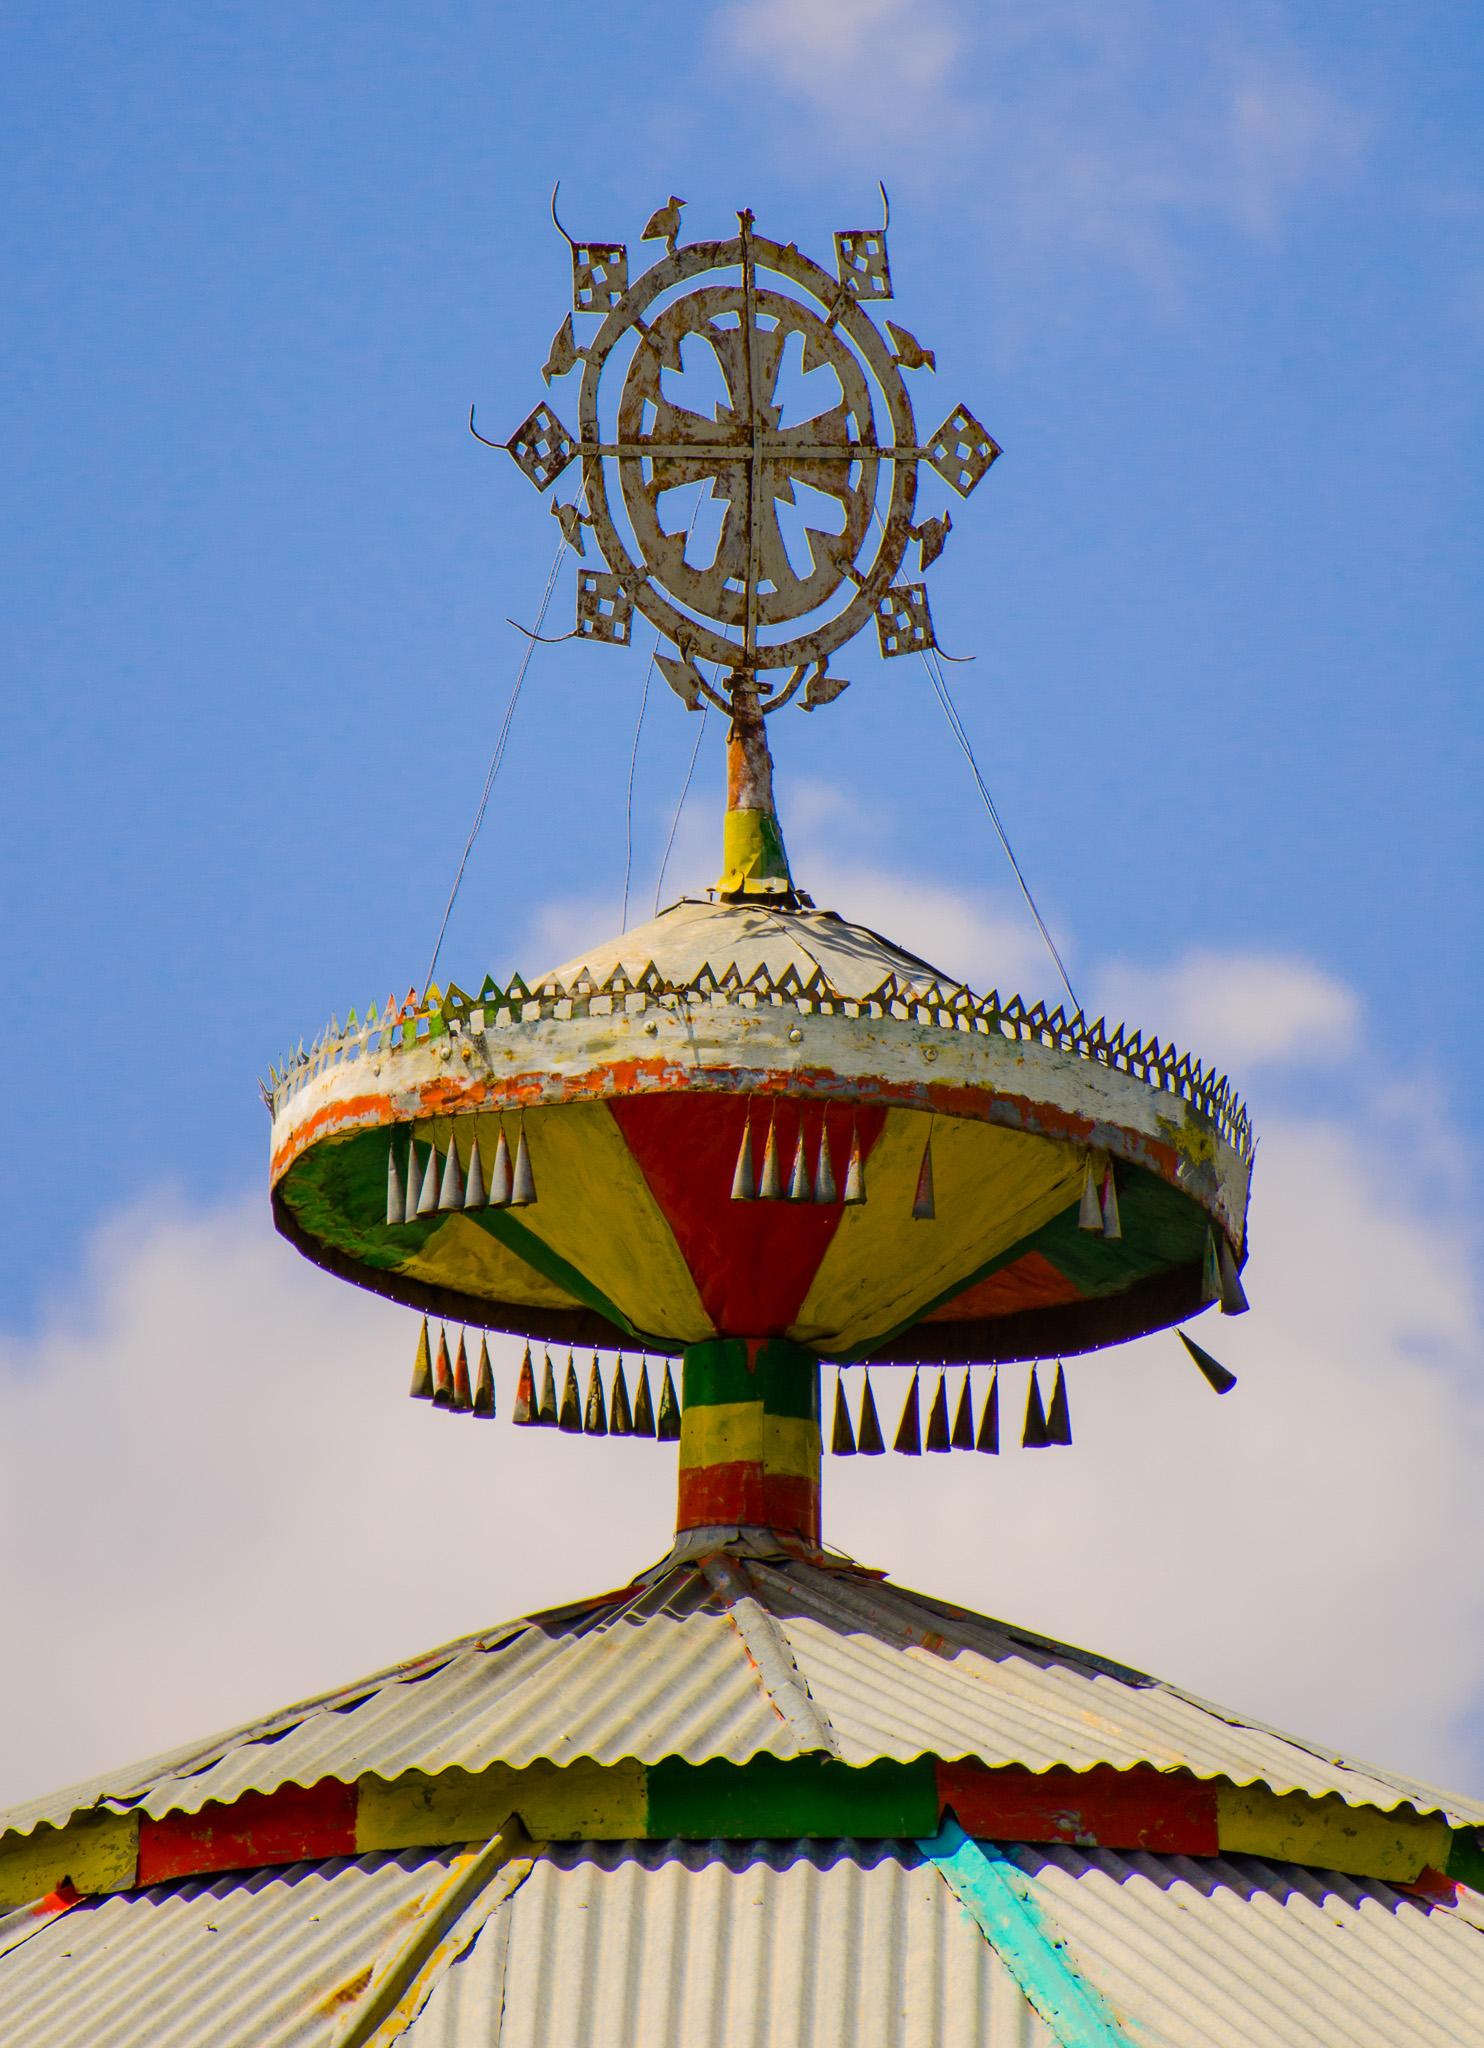 Ornate crosses adorn each church